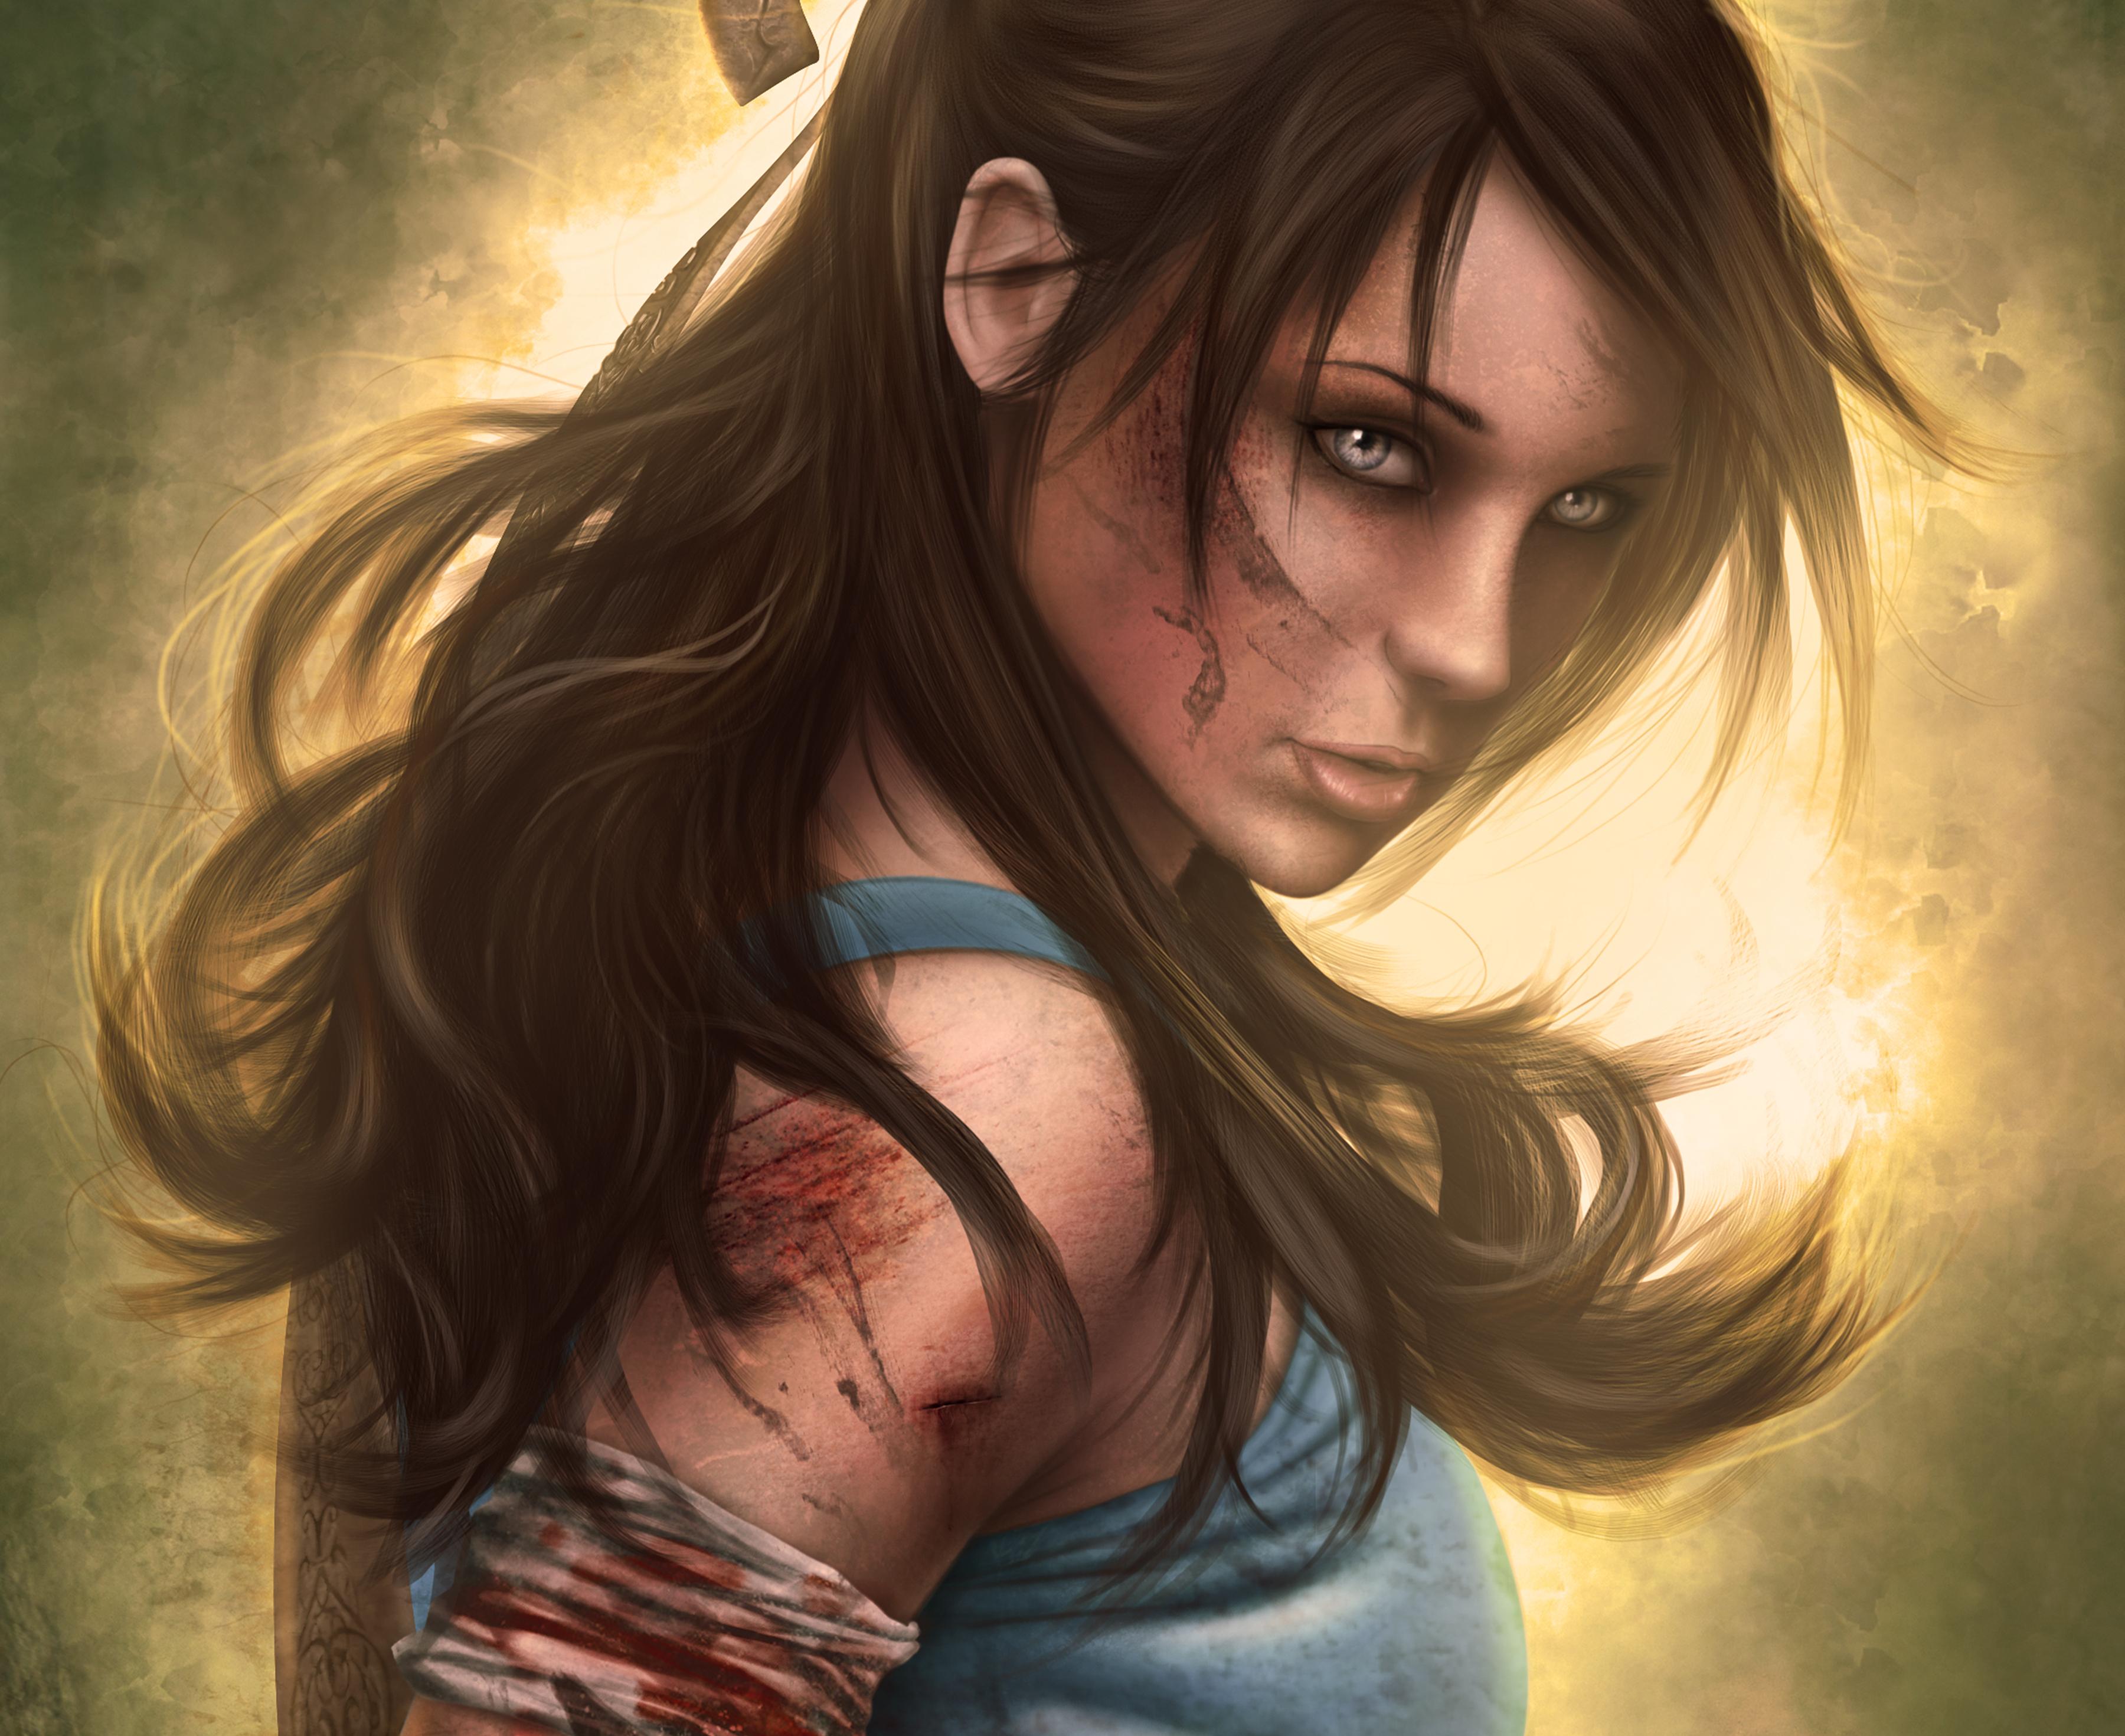 Lara croft hair nude toons